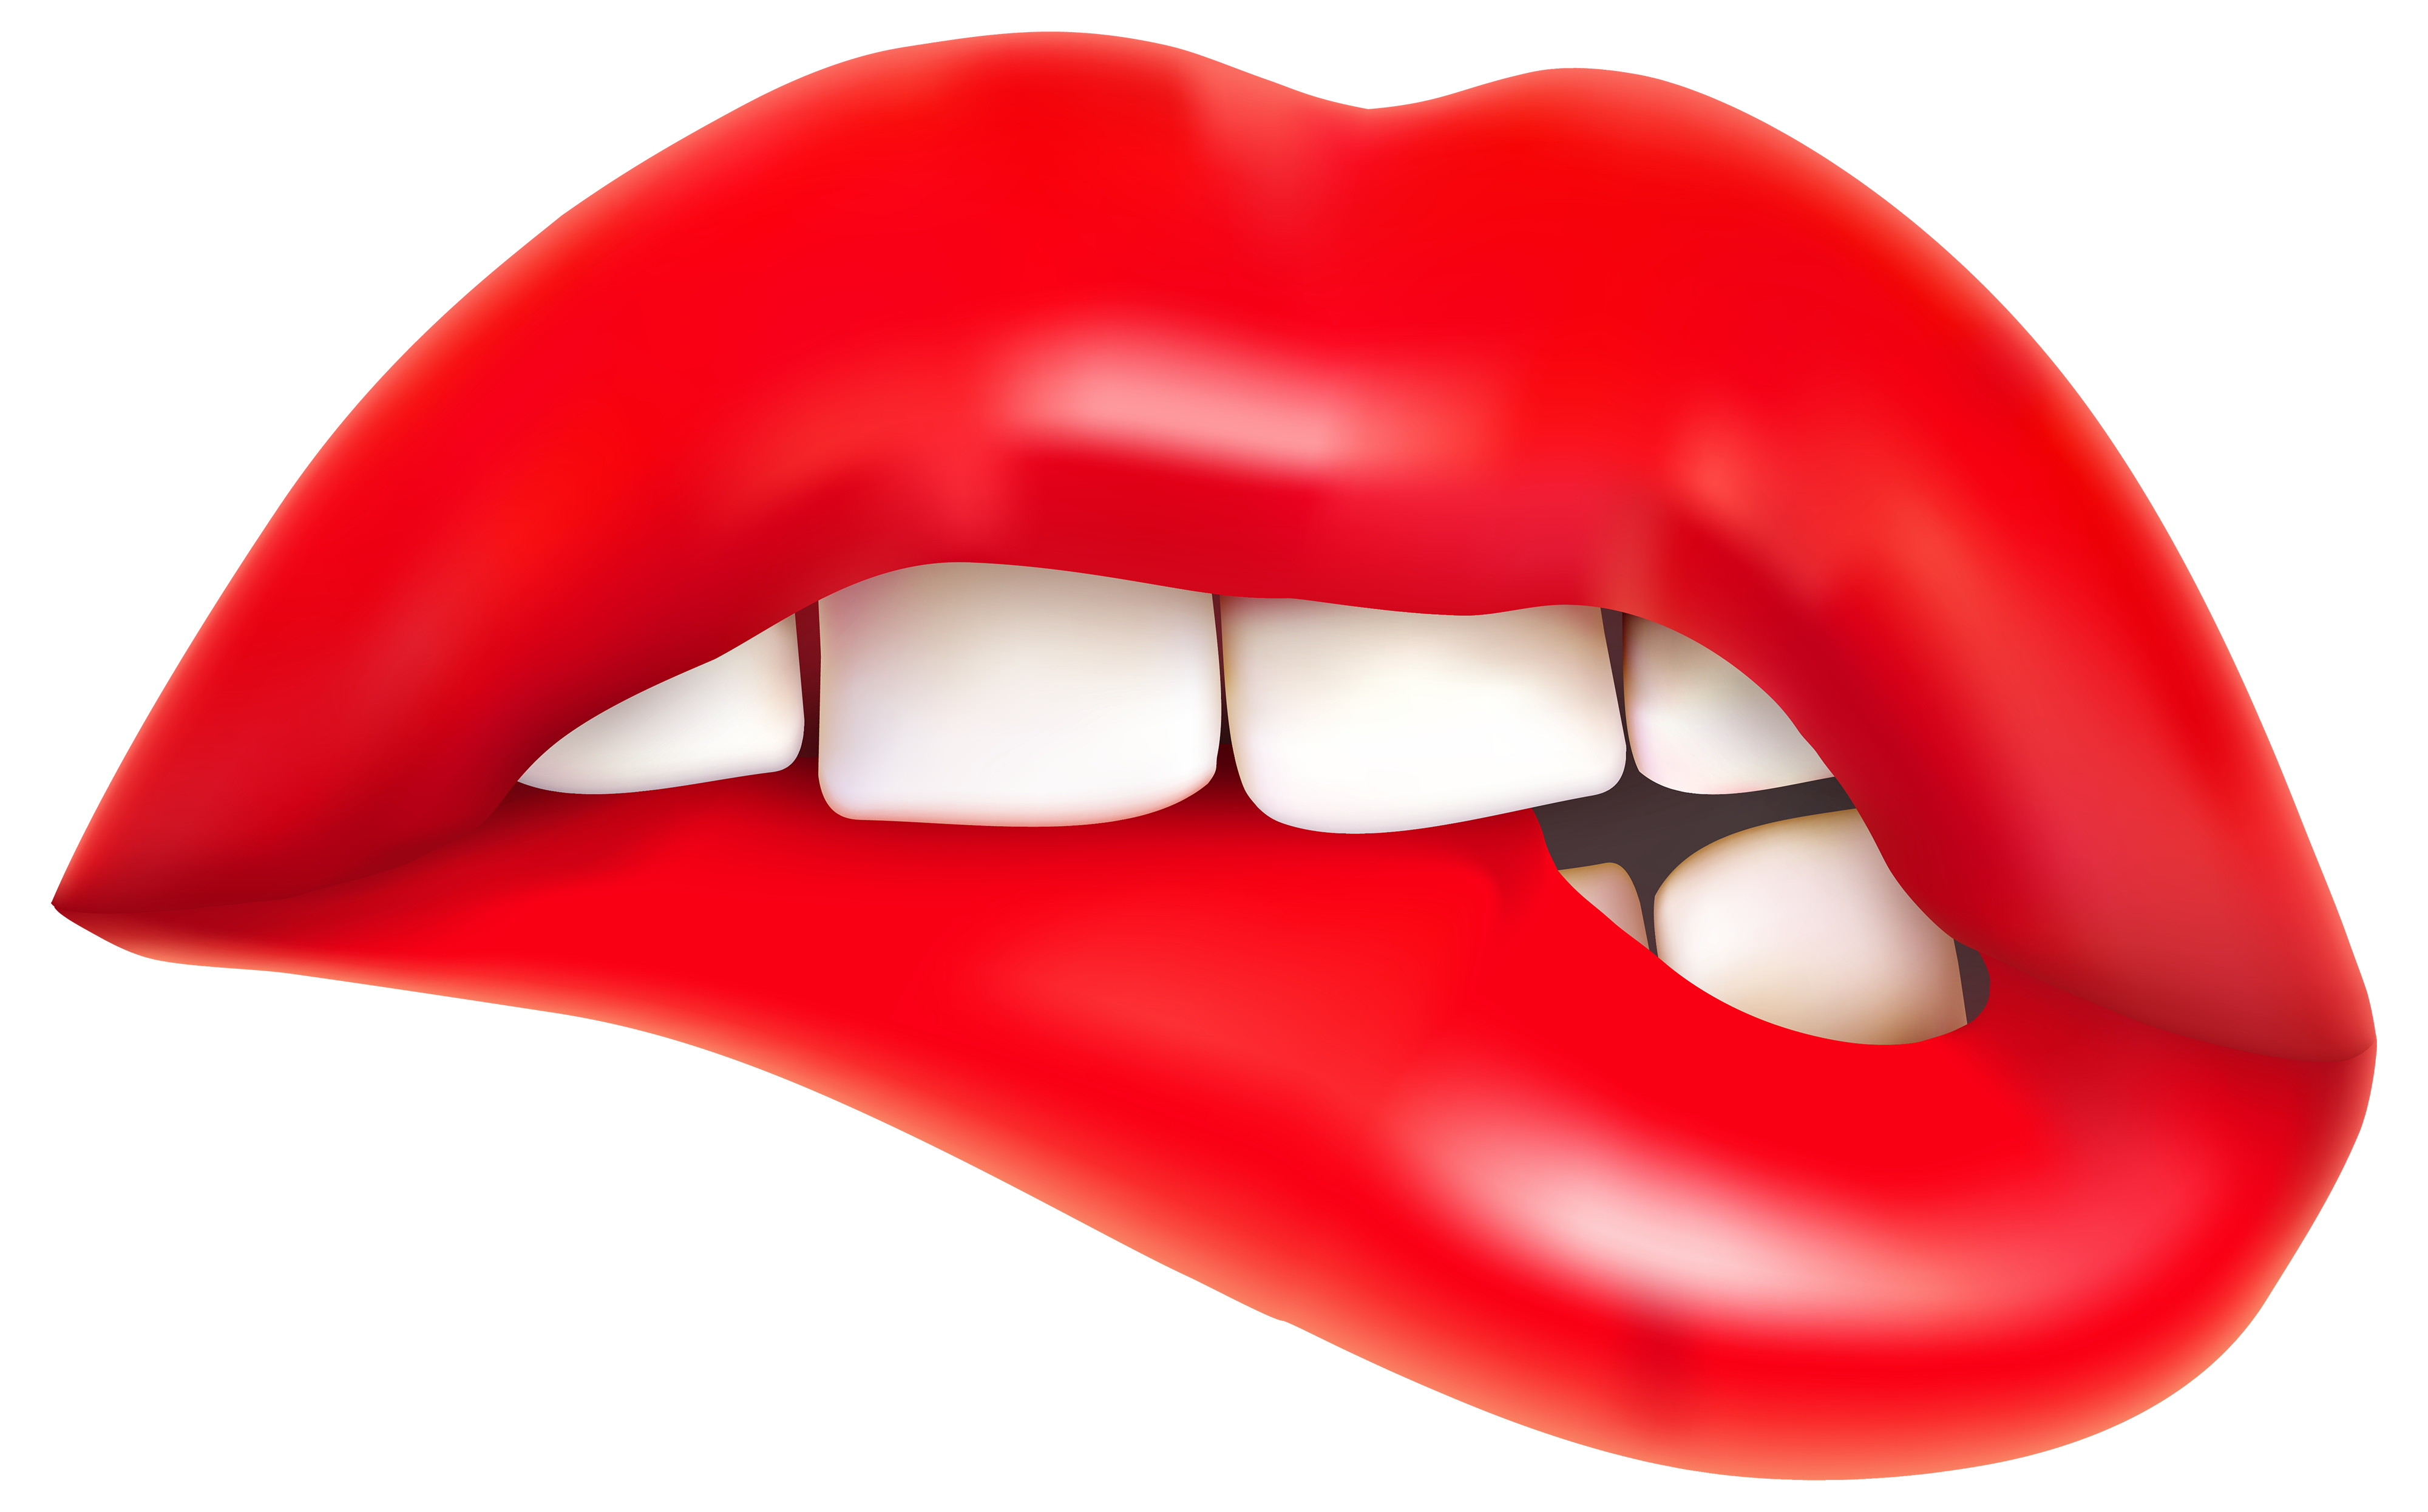 jpg free stock Lips png the best. Lip clipart pop art.